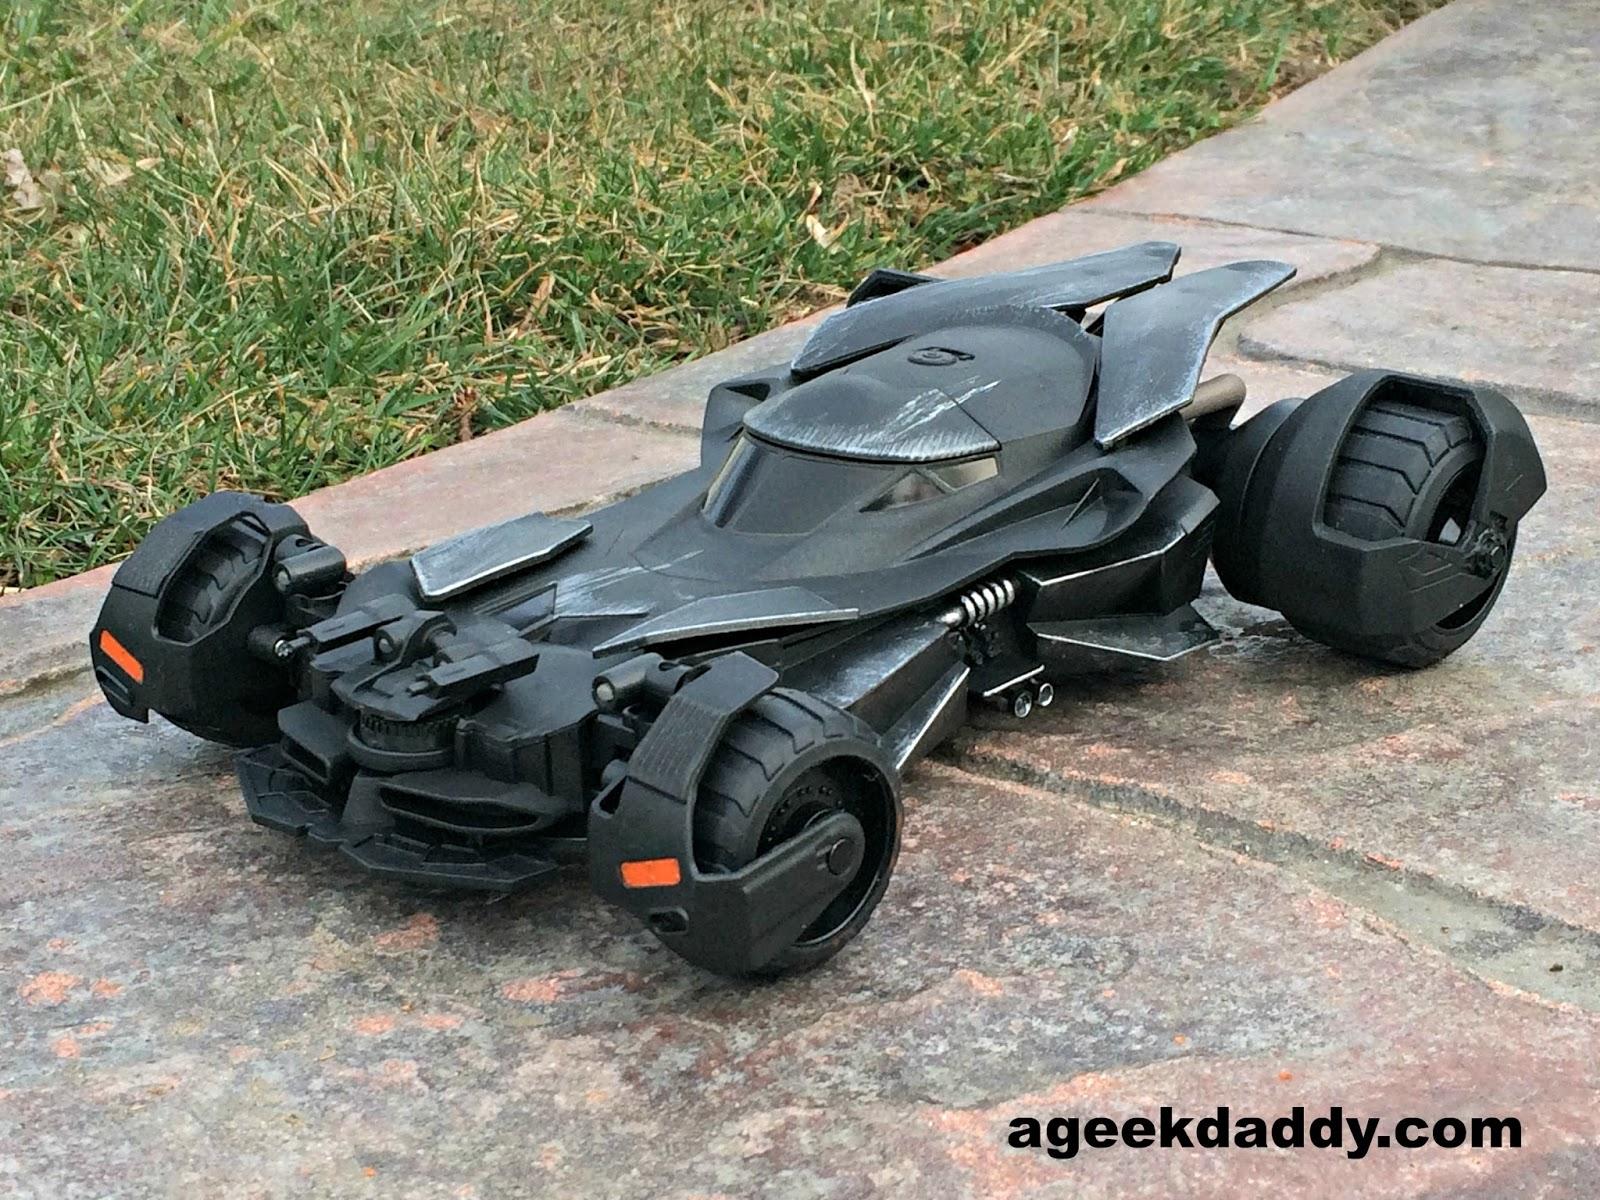 A GEEK DADDY: Air Hogs Remote Control Batmobile